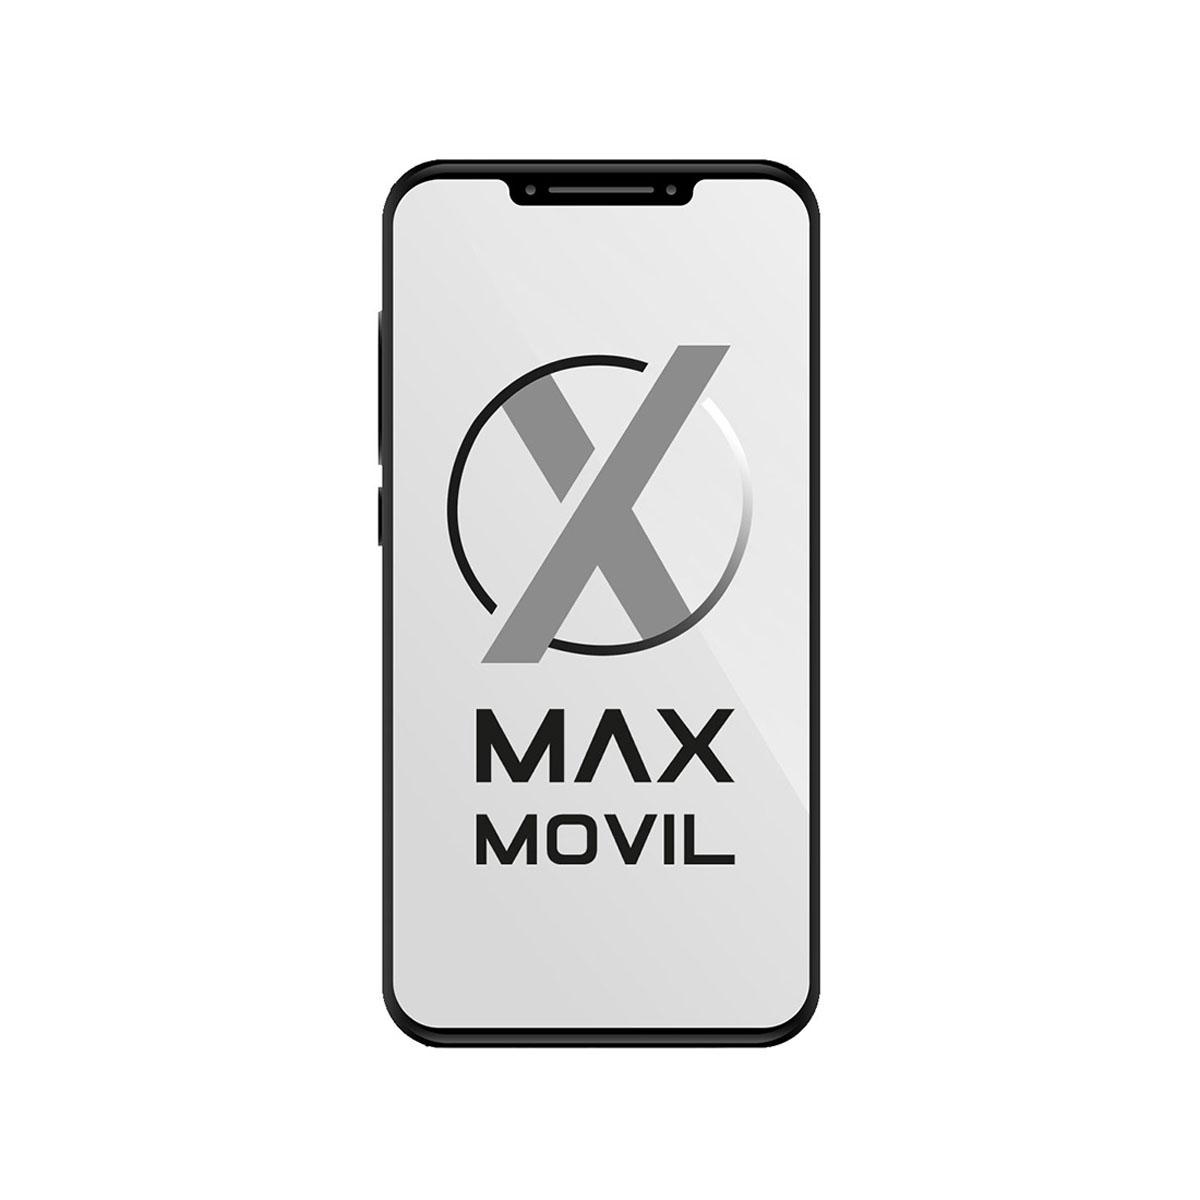 Telefono Dect Alcatel F680 DUO Teclas Grandes 3 Memorias directas Gran Pantalla retroiluminada M/Libres 5 Niveles de volumen